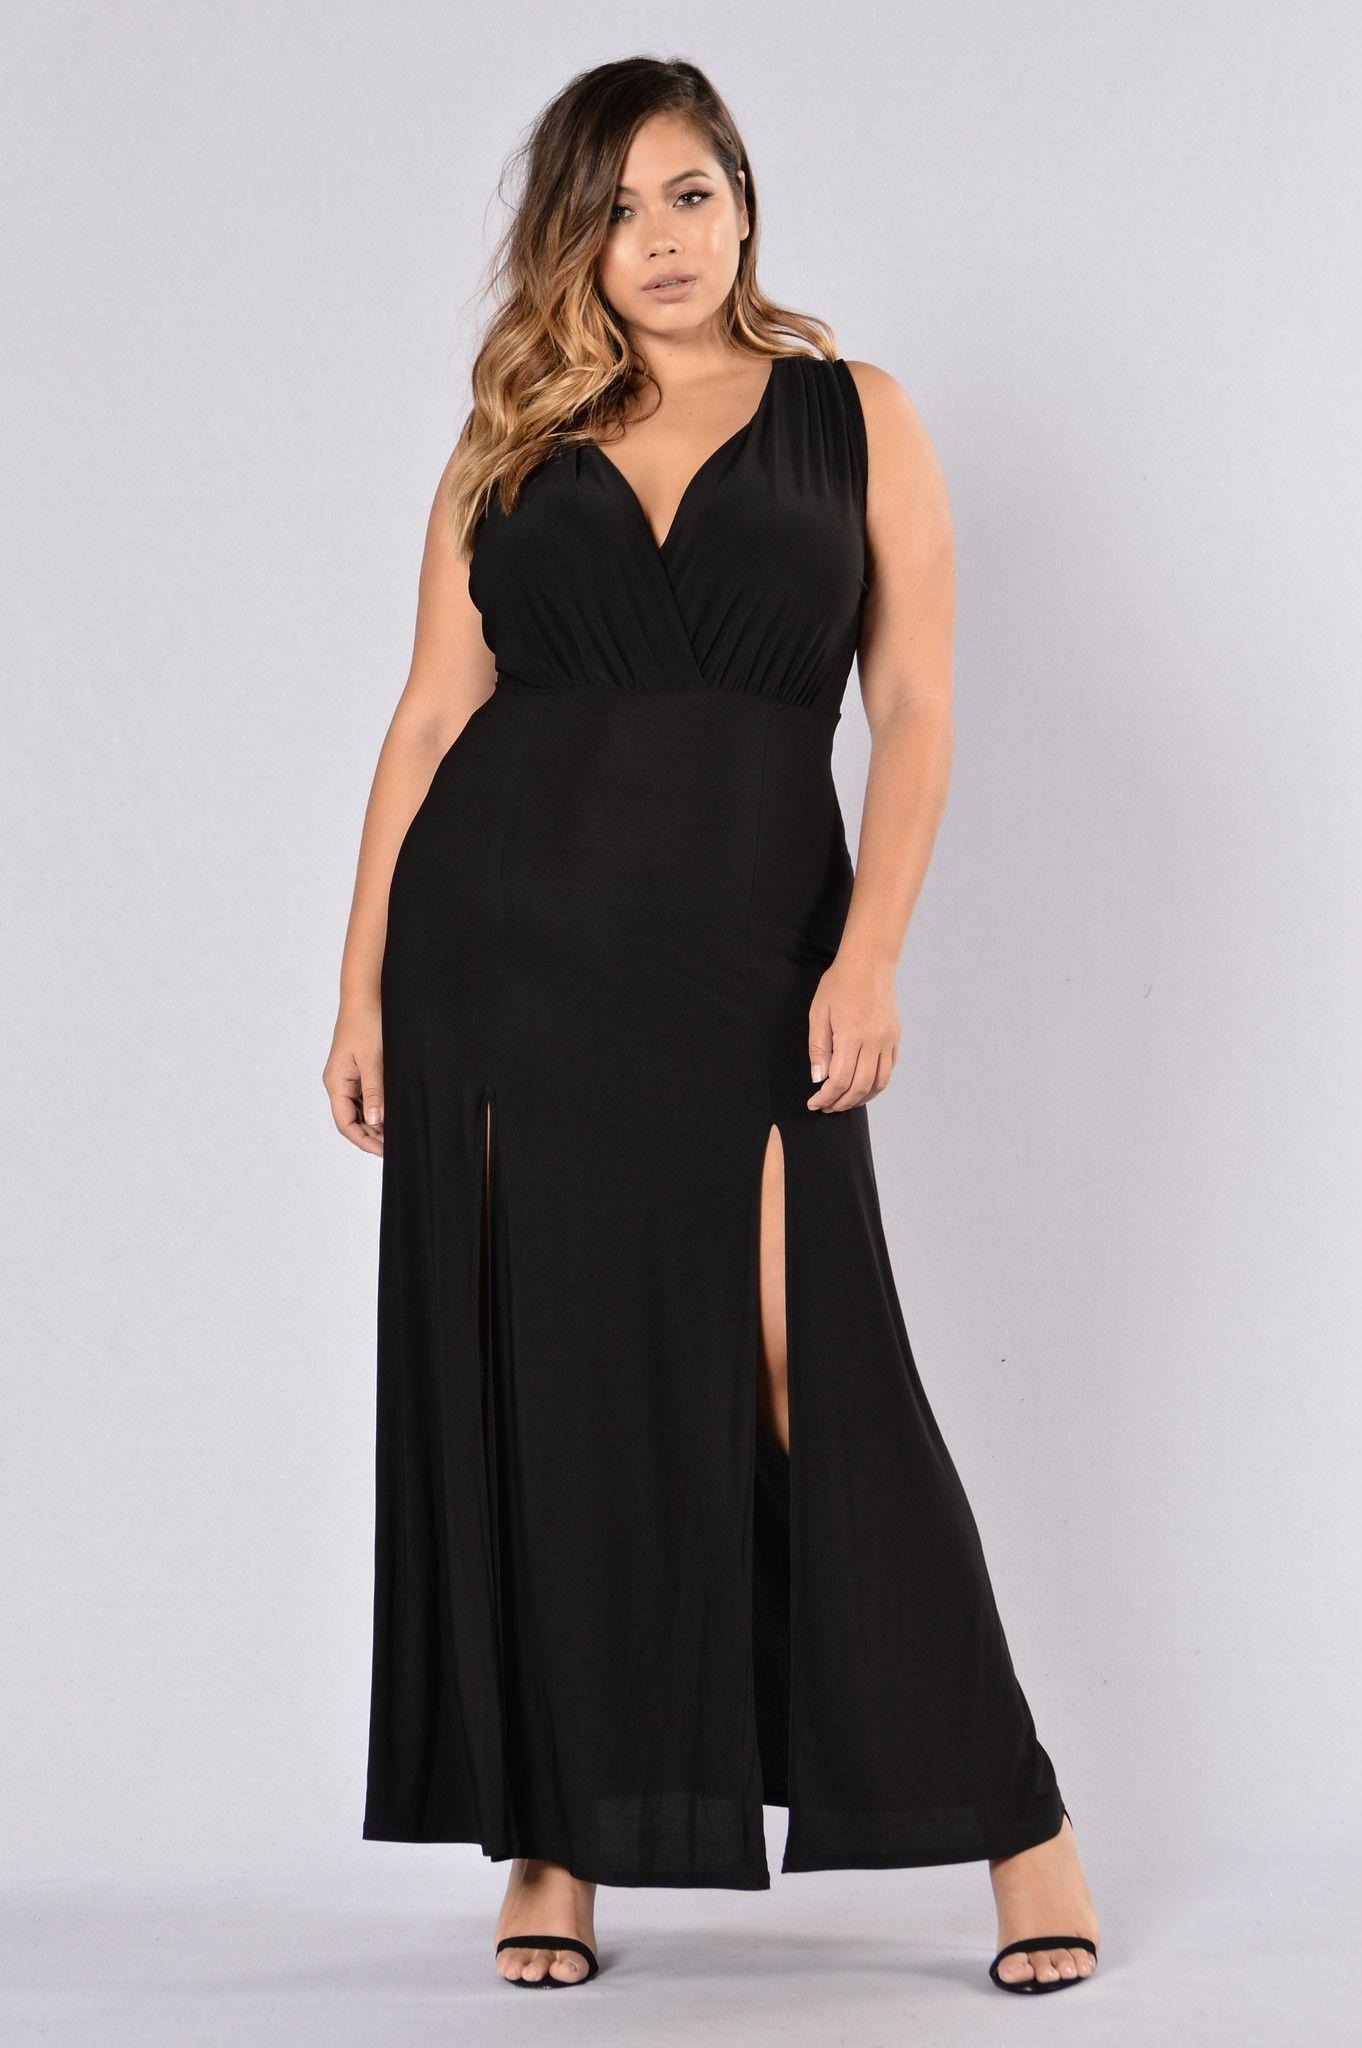 Double Up Dress - Black